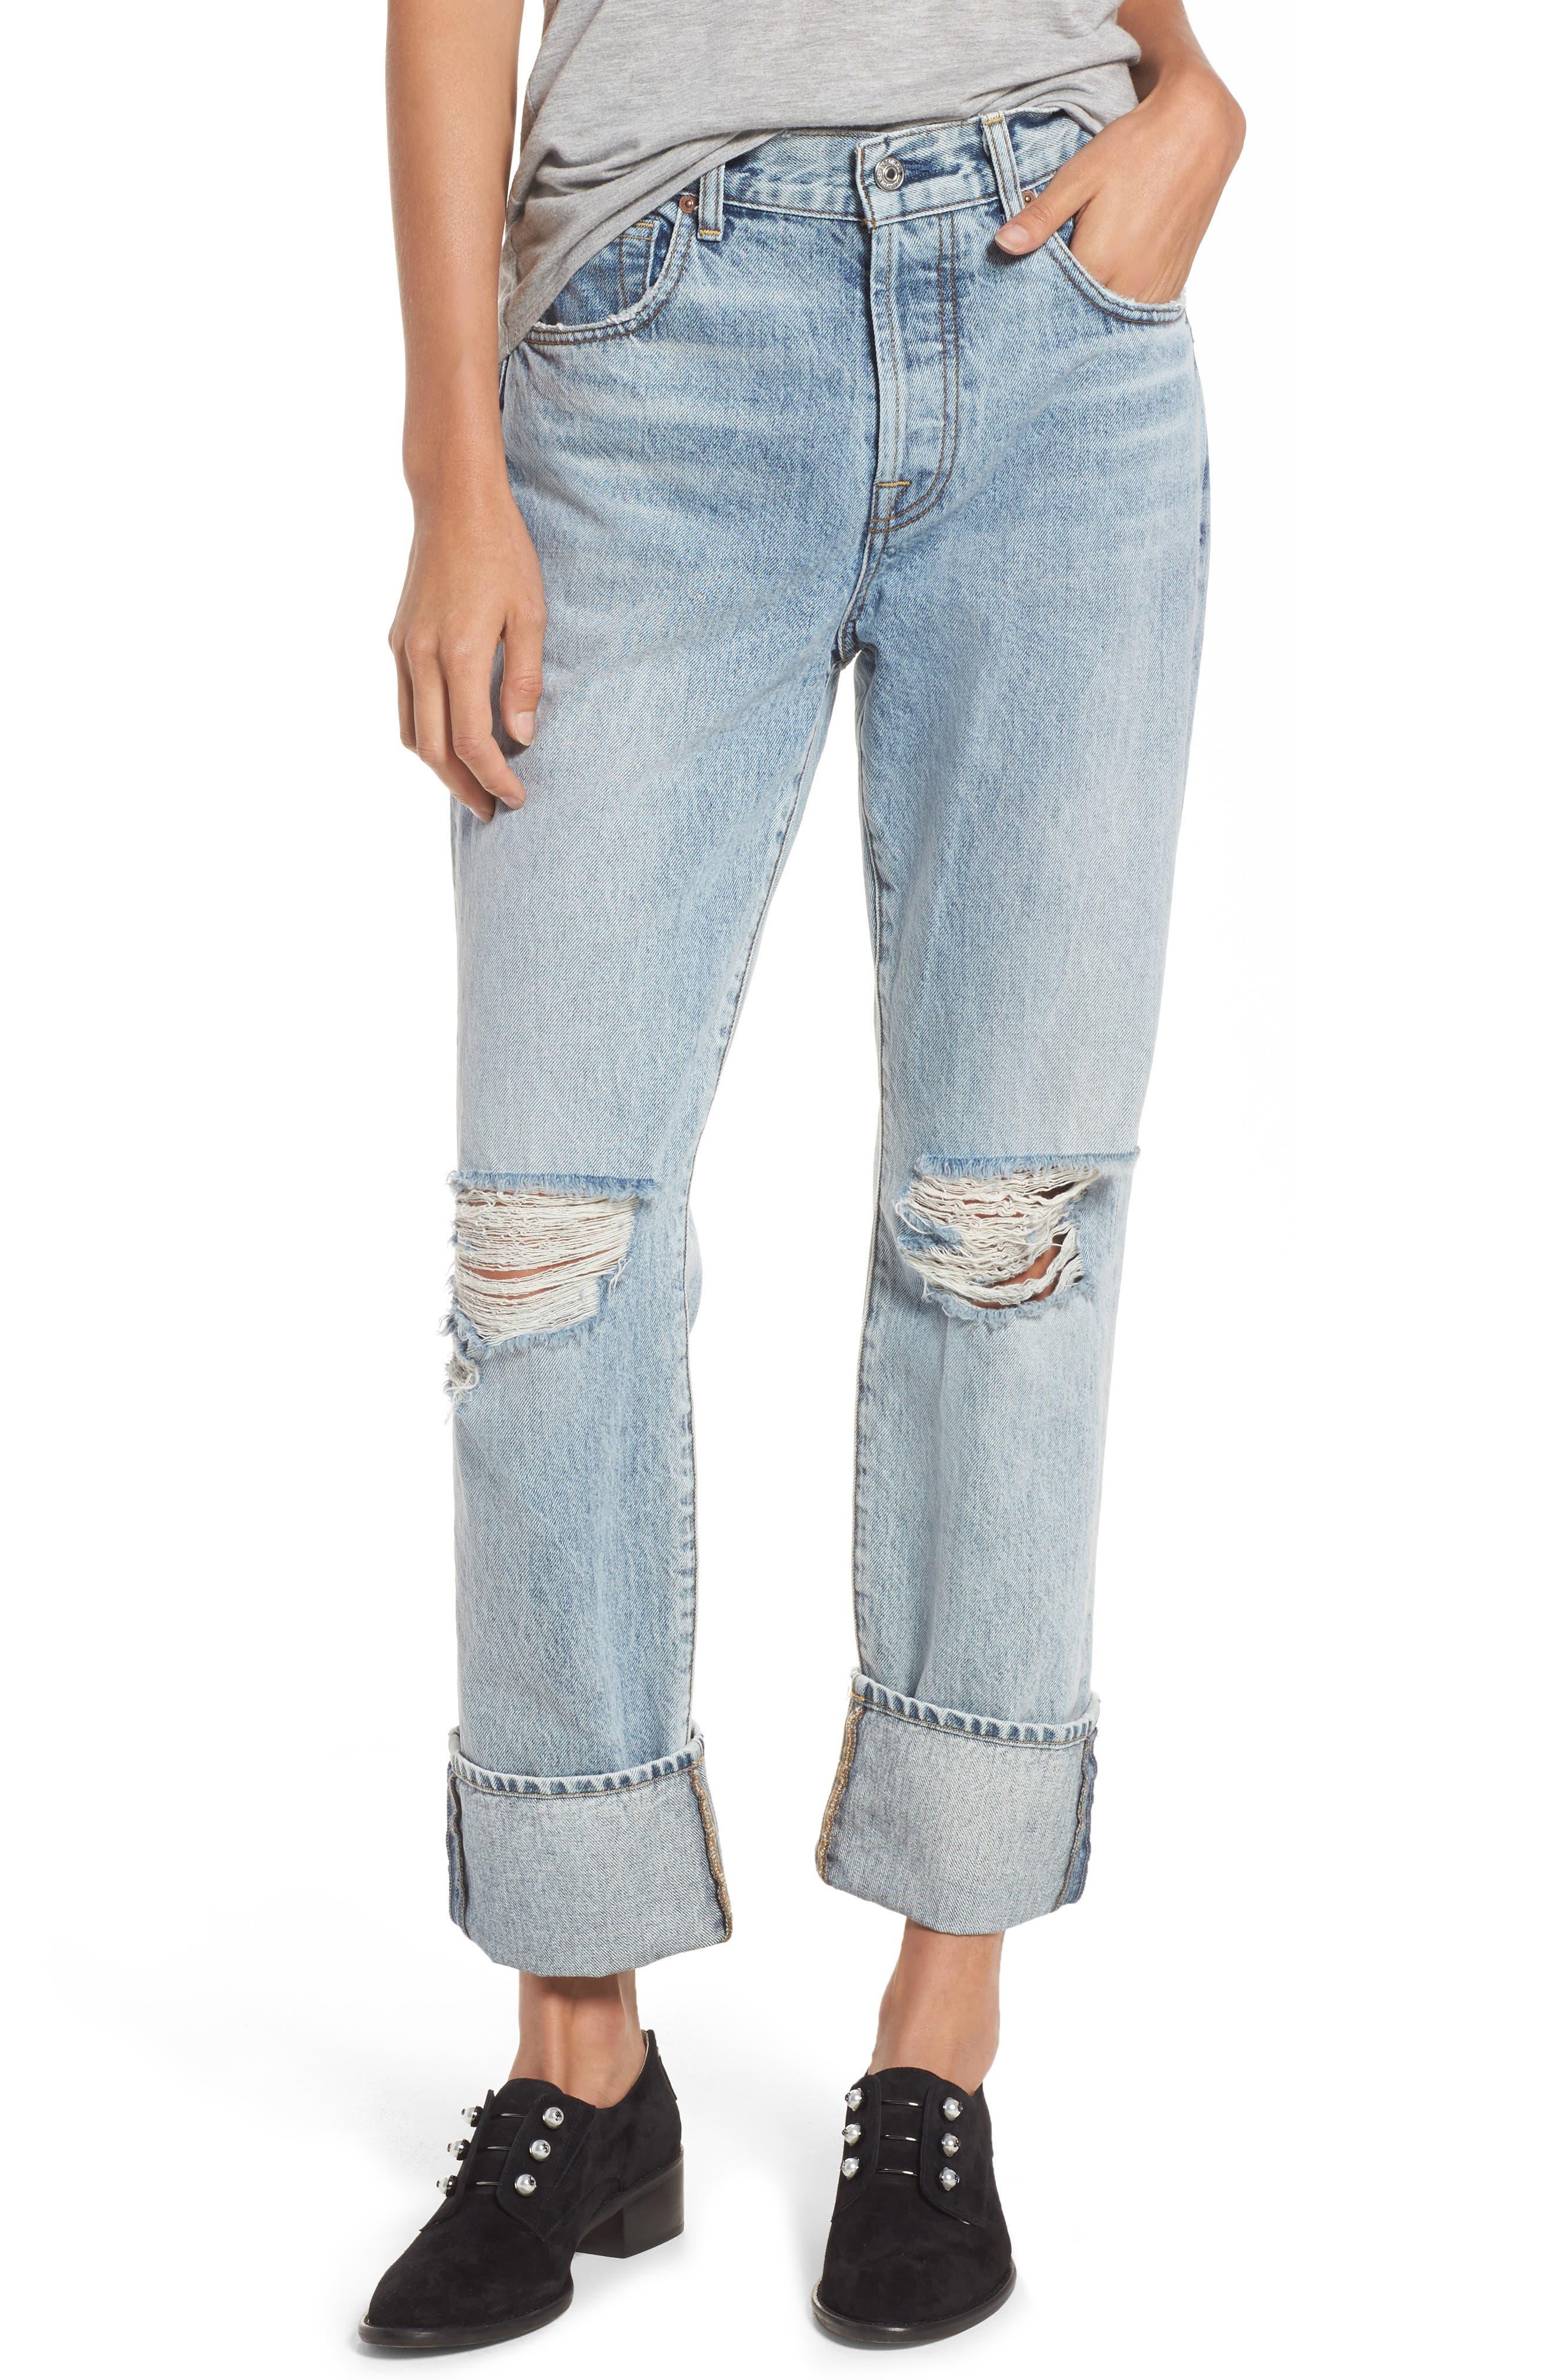 Main Image - 7 For All Mankind® Rickie High Waist Boyfriend Jeans (Mineral Desert Springs)